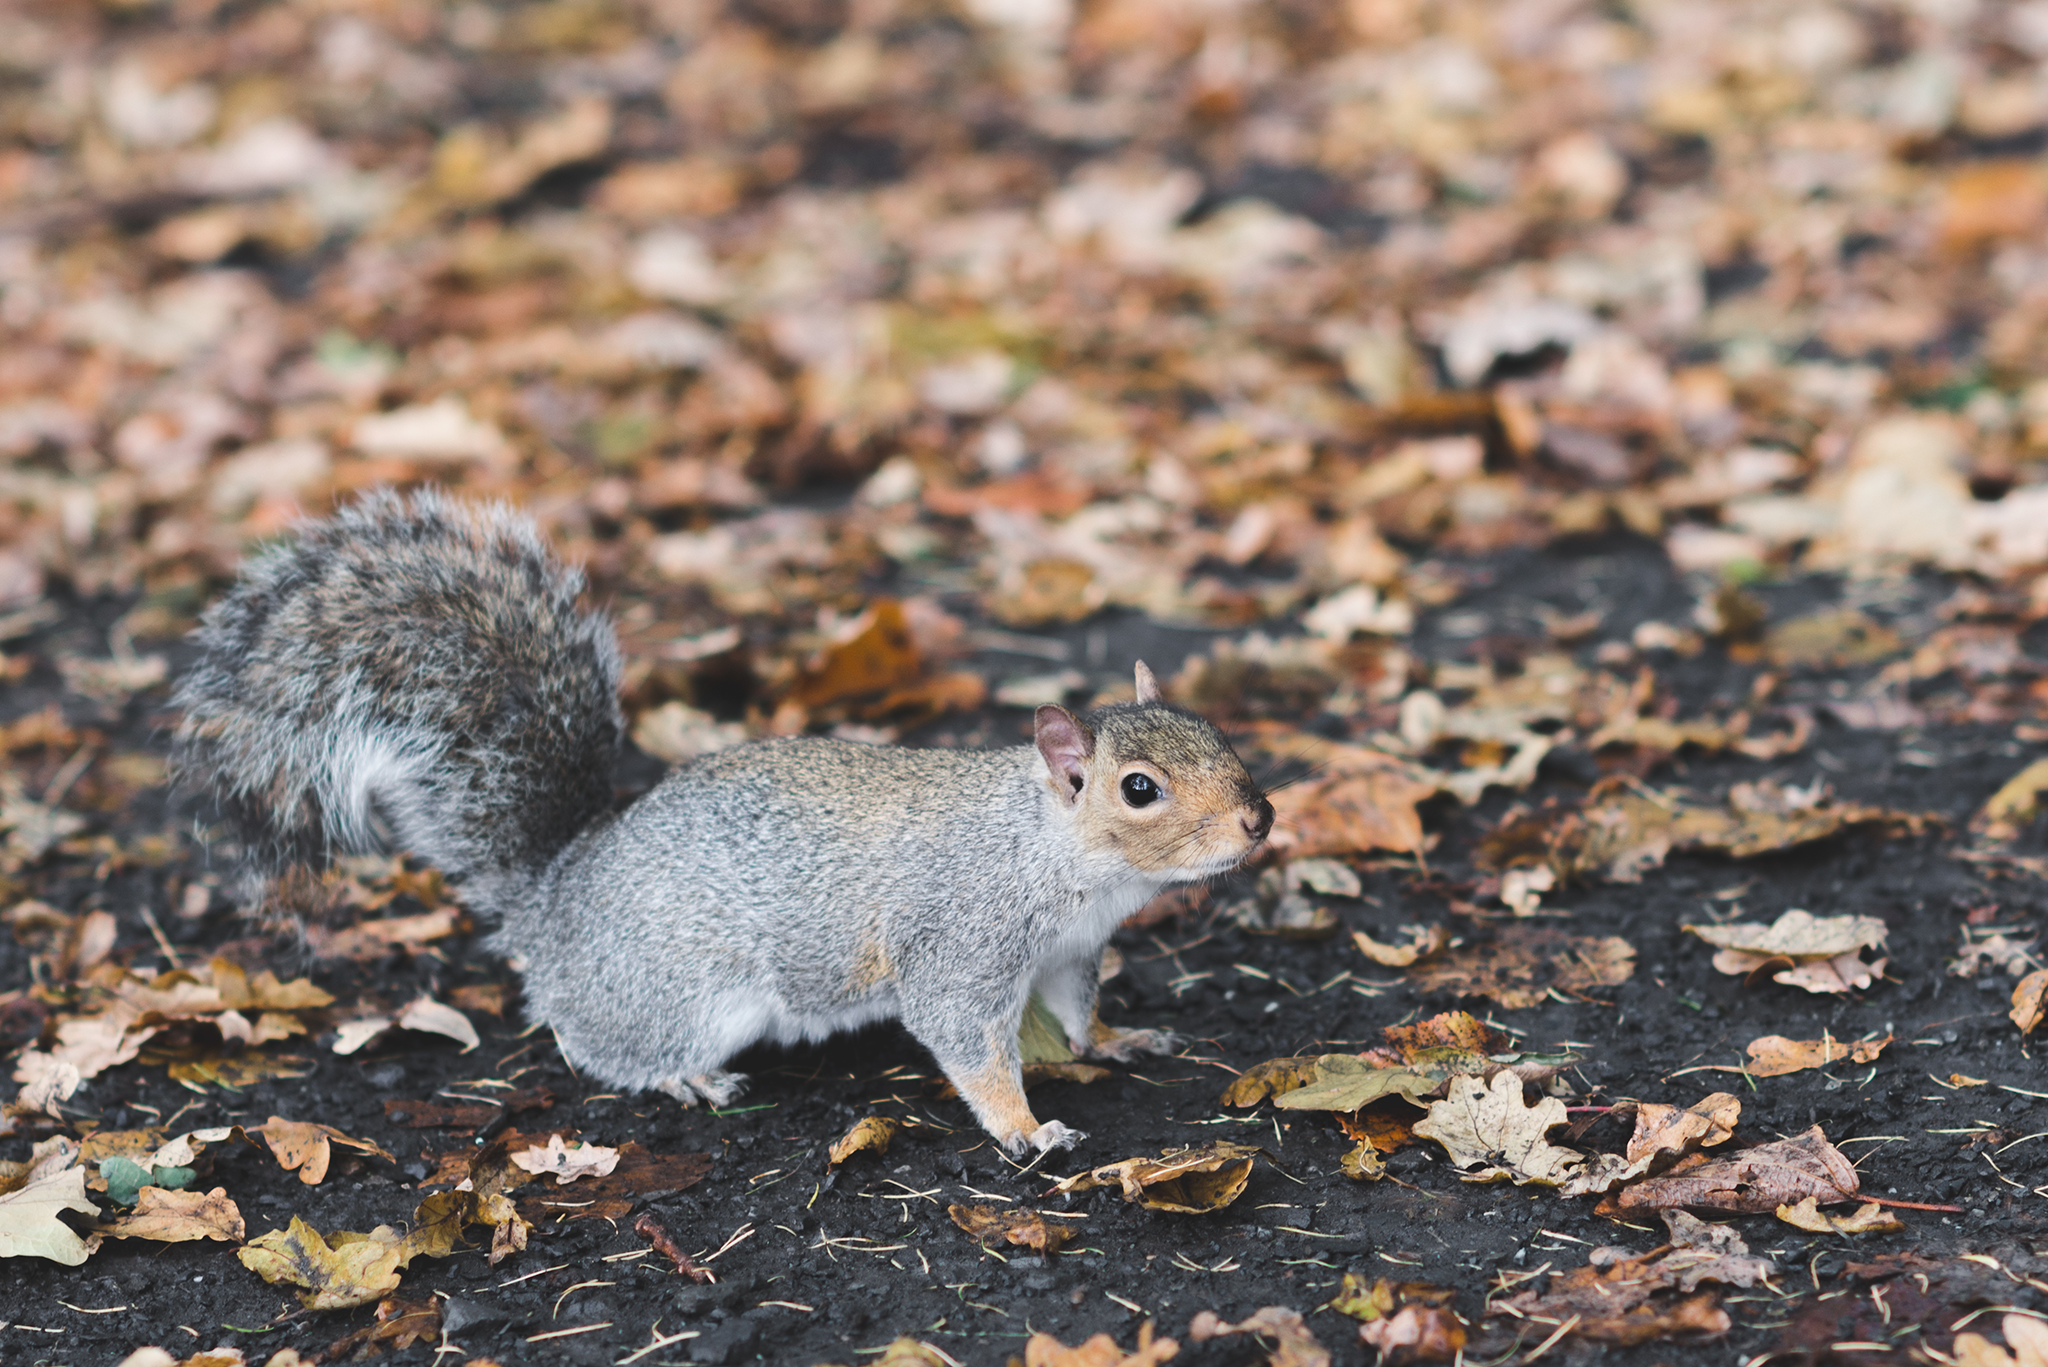 Northern_Ireland_Engagement_Photography_purephotoni_Lurgan_Park_Squirrel